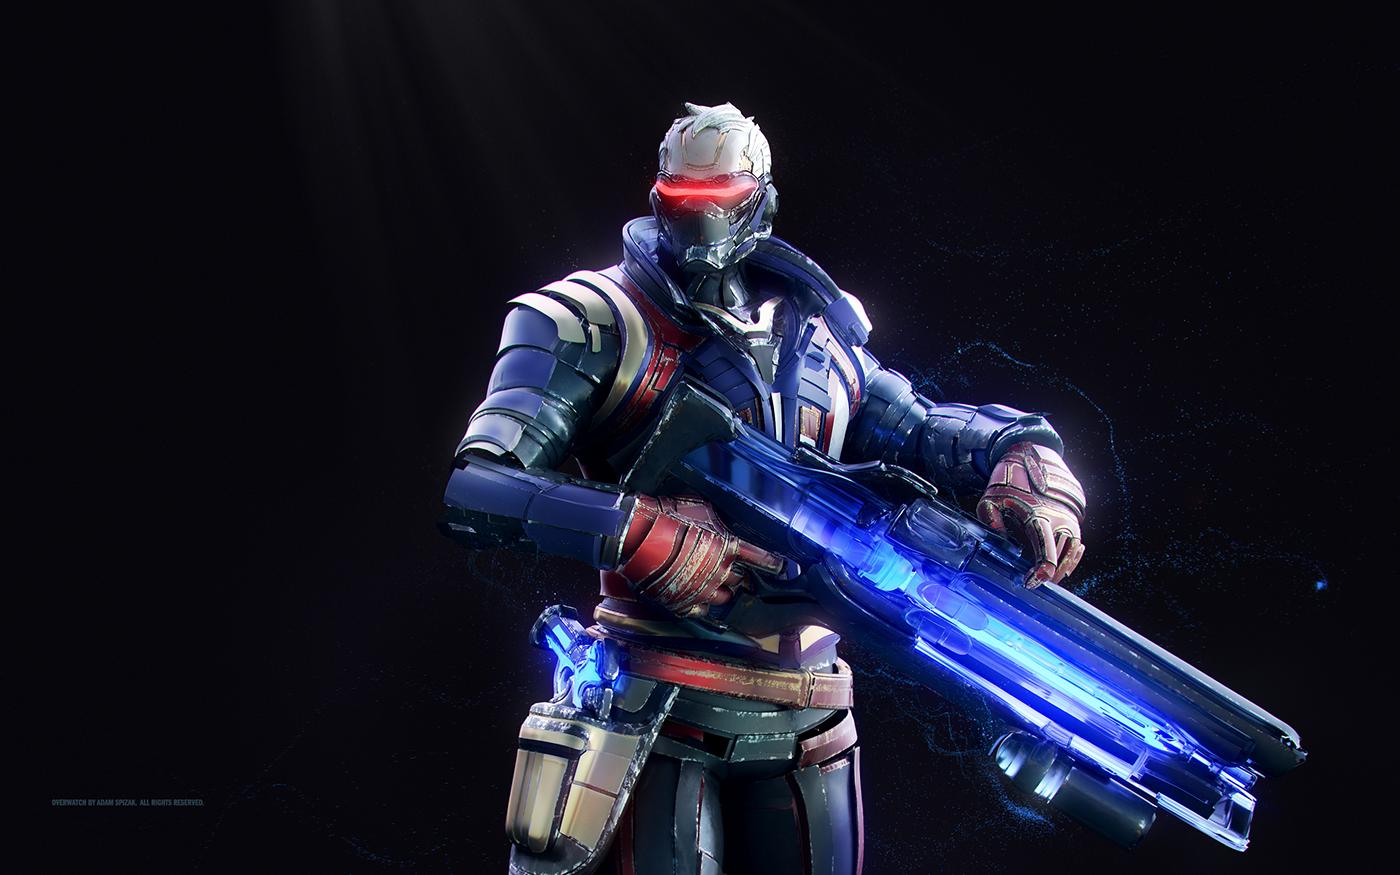 Overwatch On Behance Soldier 76 Overwatch Overwatch Wallpapers